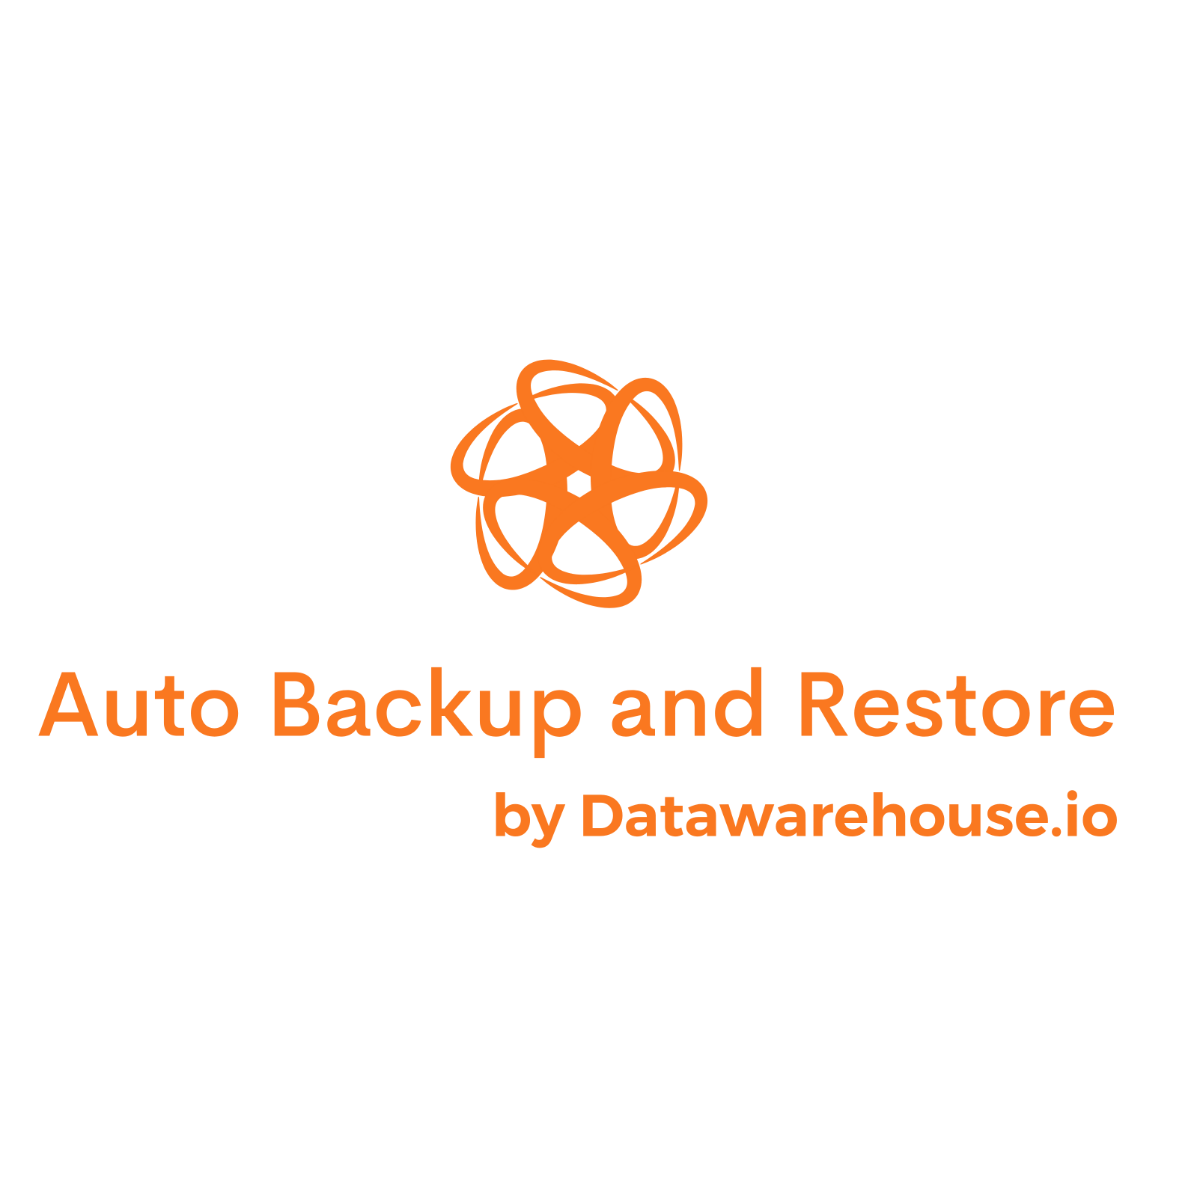 Backup and Restore logo